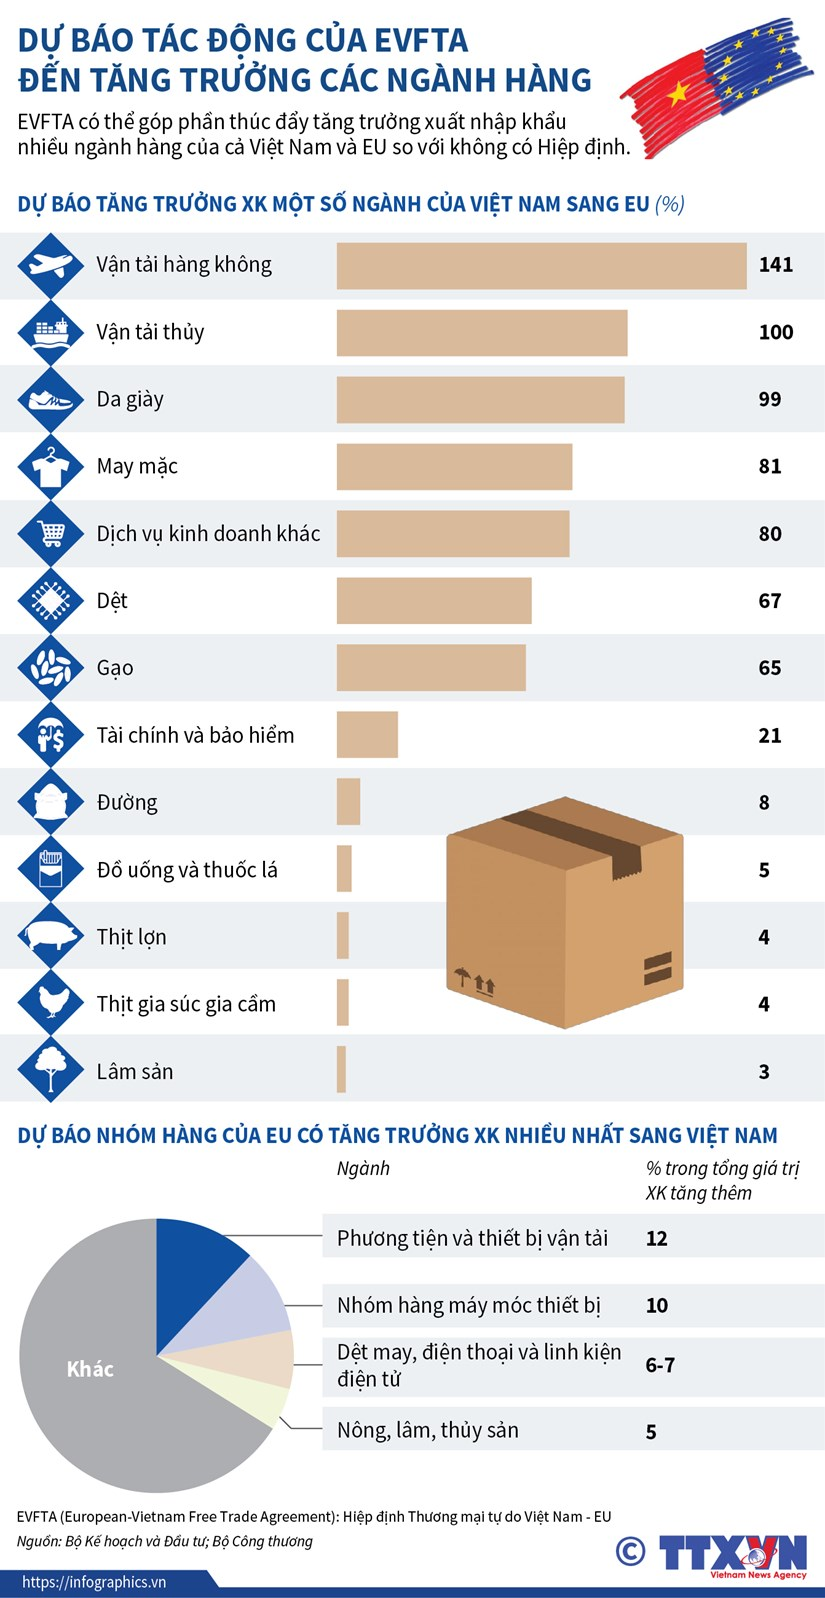 [Infographics] Du bao tac dong cua EVFTA den tang truong nganh hang hinh anh 1